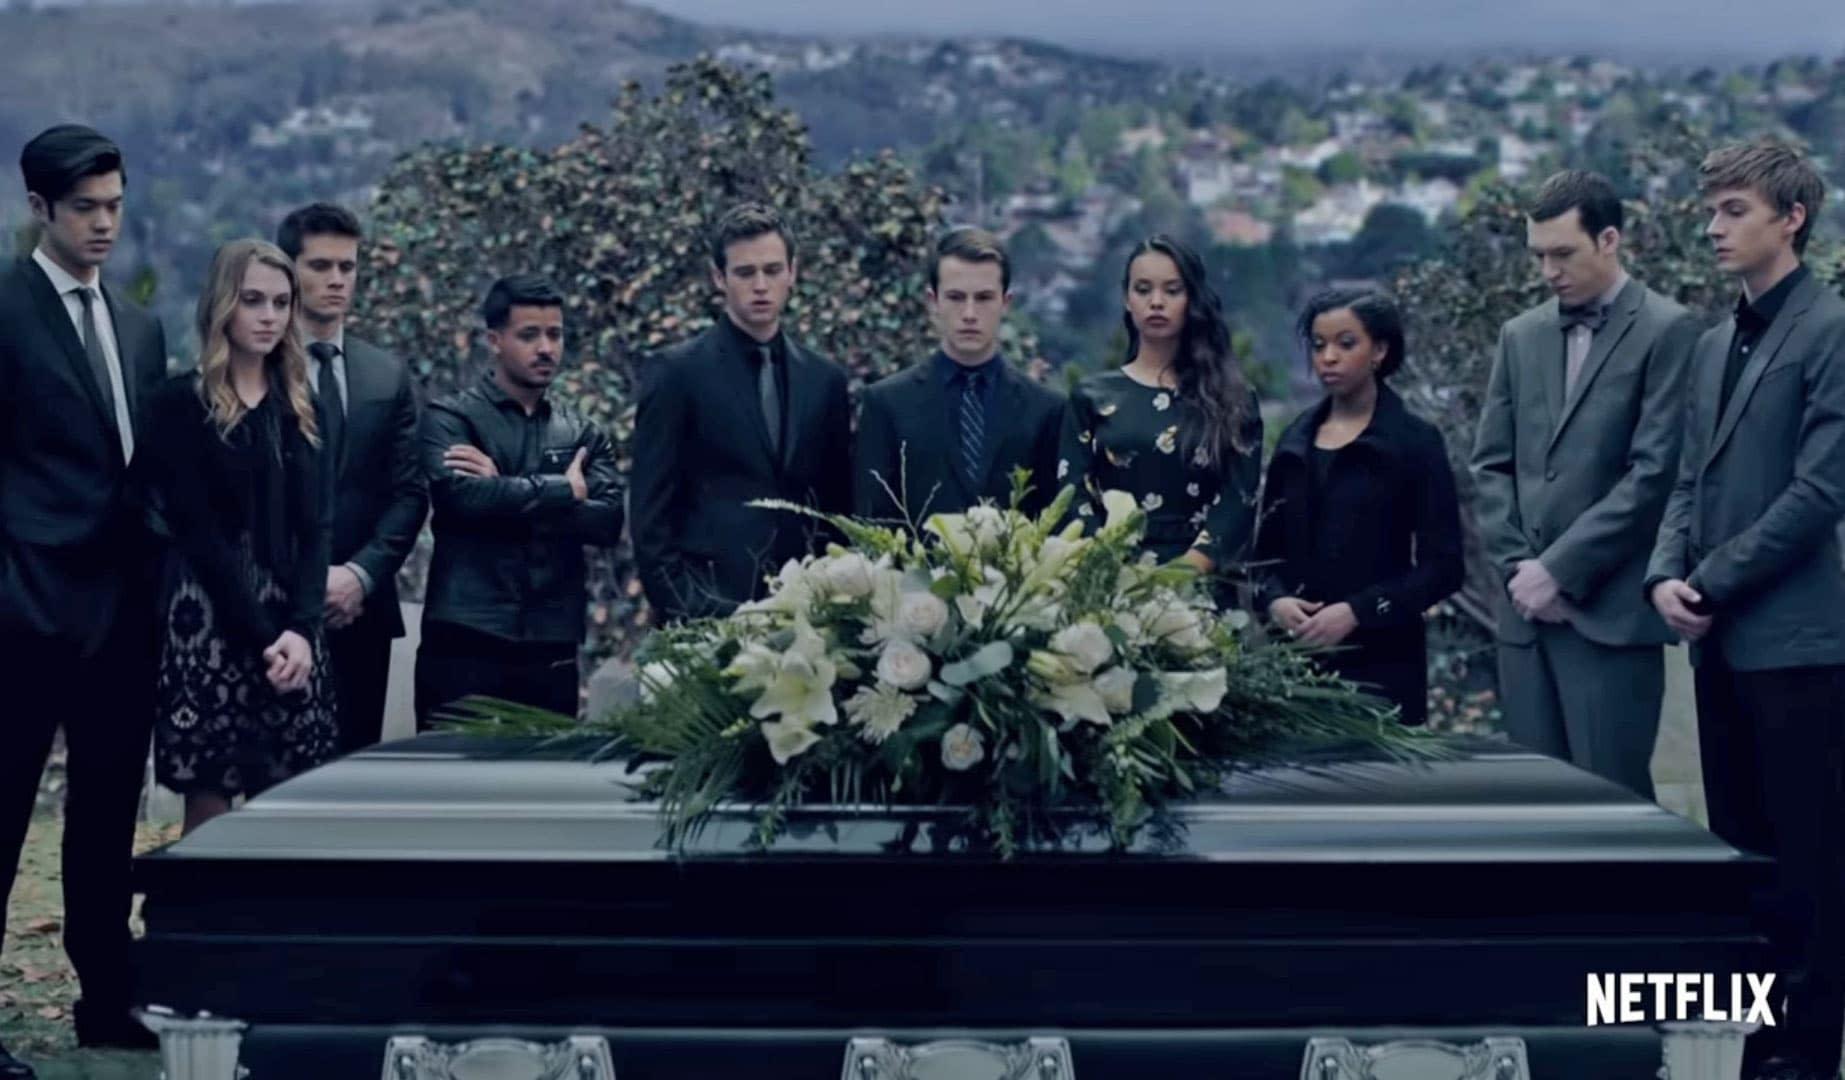 13 Reasons Why' kills off a major character in season 3 | Engadget